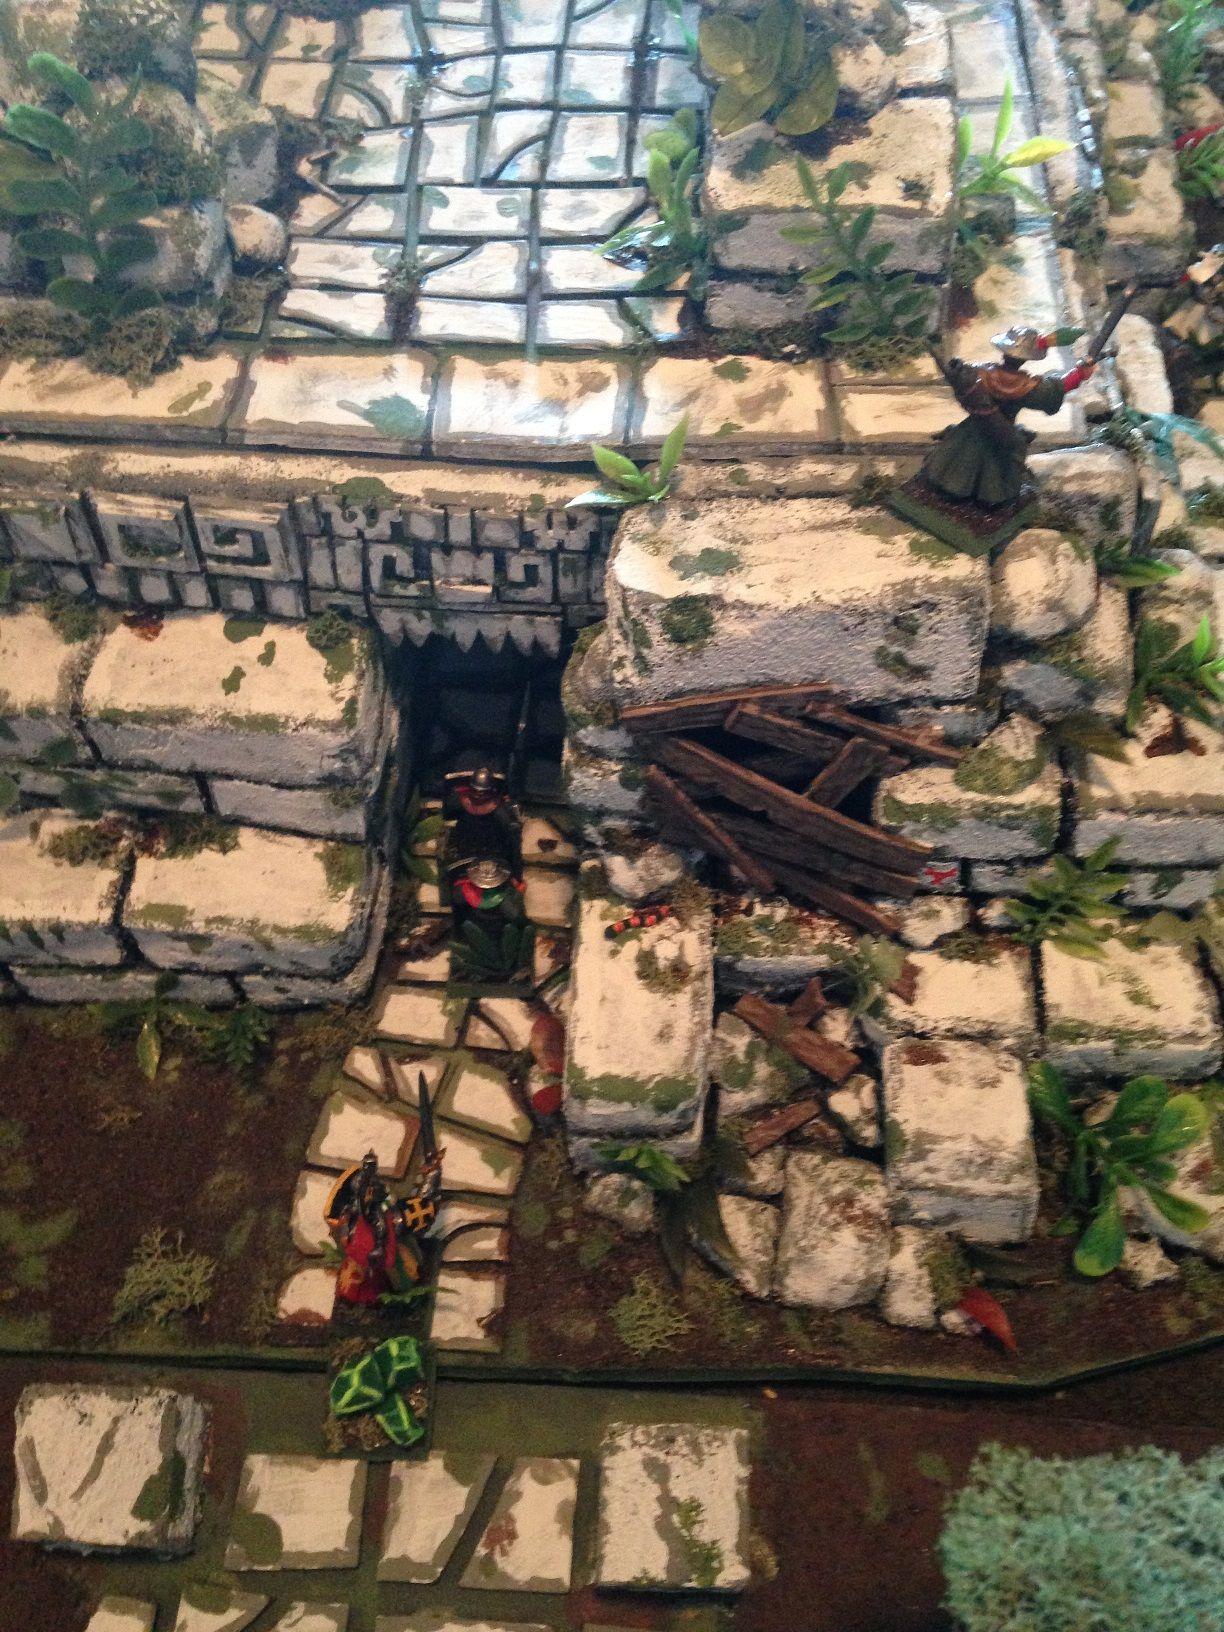 Miniature Terrain - Wildbird Games